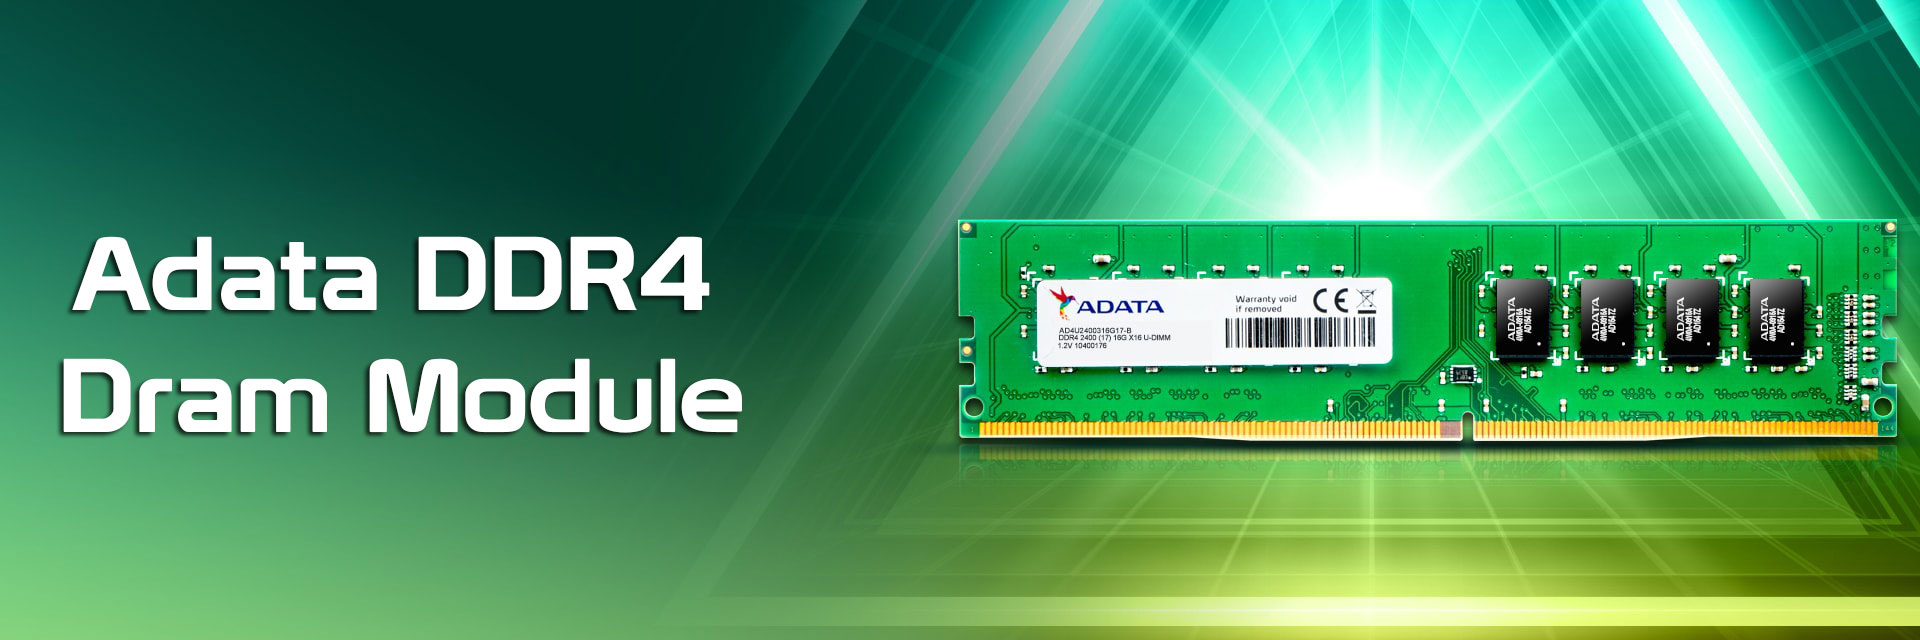 رم کامپيوتر اي ديتا مدل Premier DDR4 2400MHz 288Pin U-DIMM